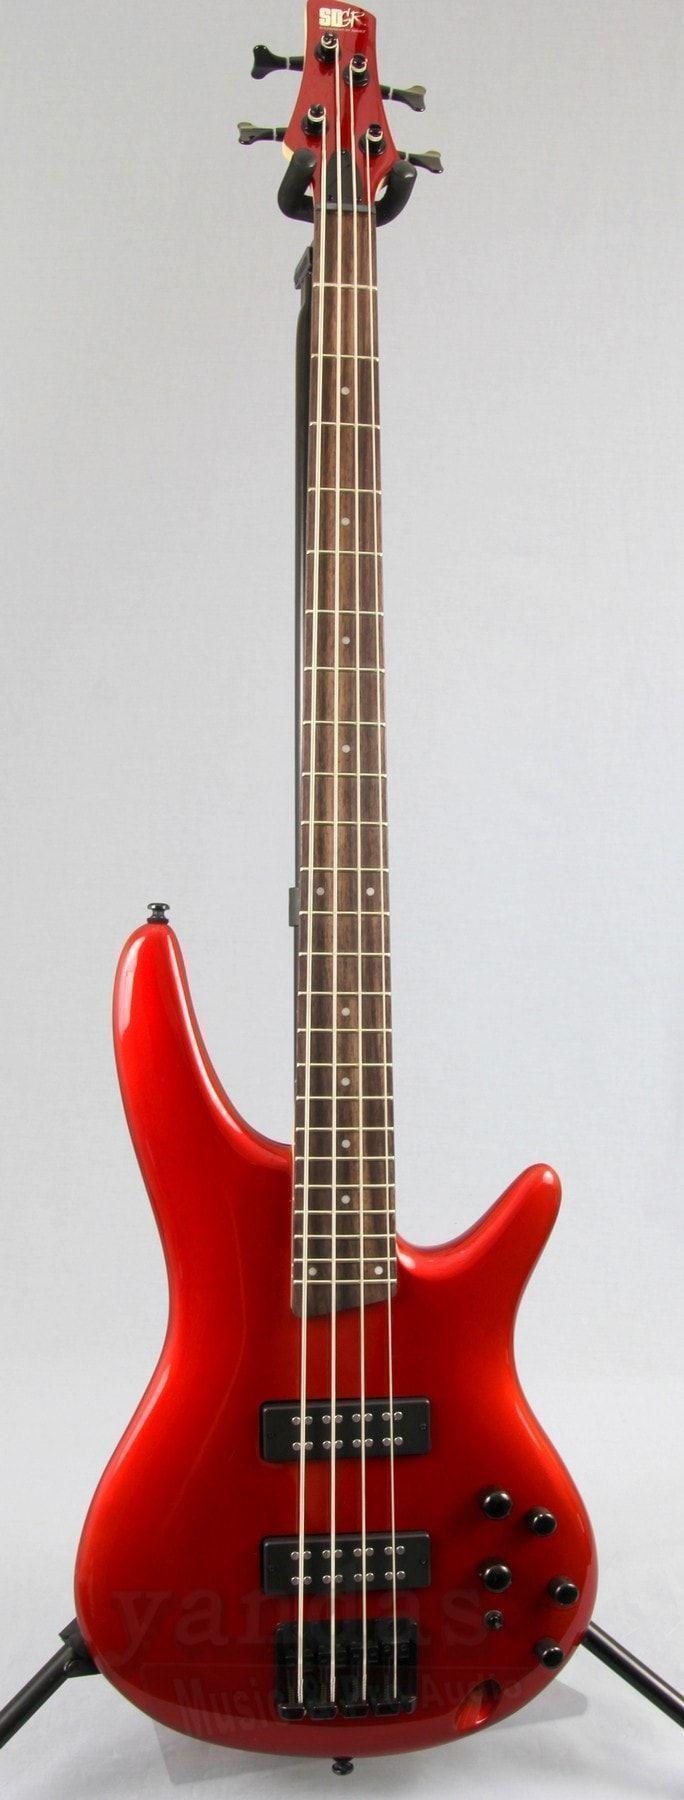 Ibanez SR300EB SR-Series Bass Guitar #vintageguitars #beautifulguitars #bassguitar